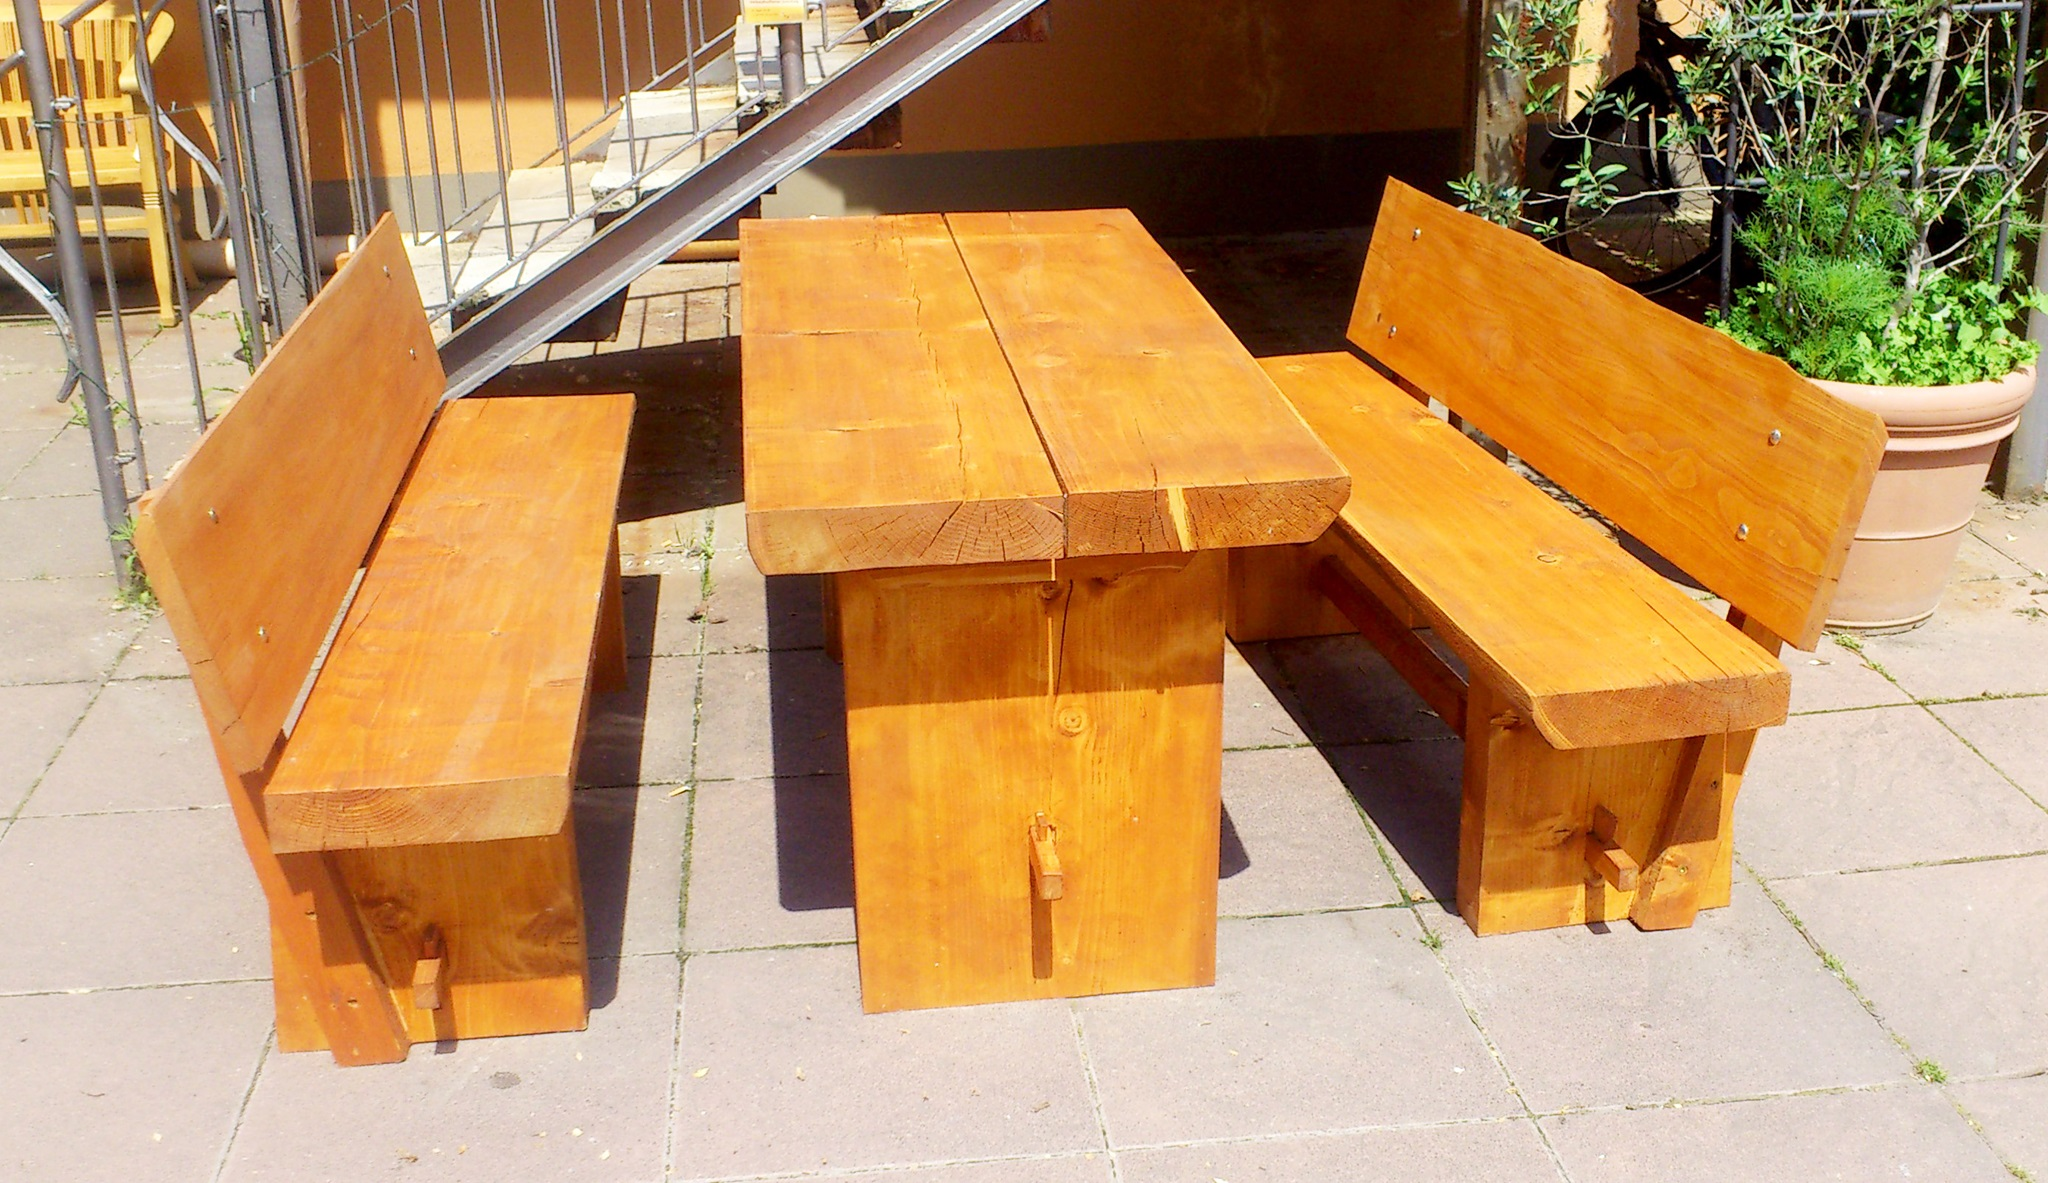 Gartenmöbel aus massivem Teakholz